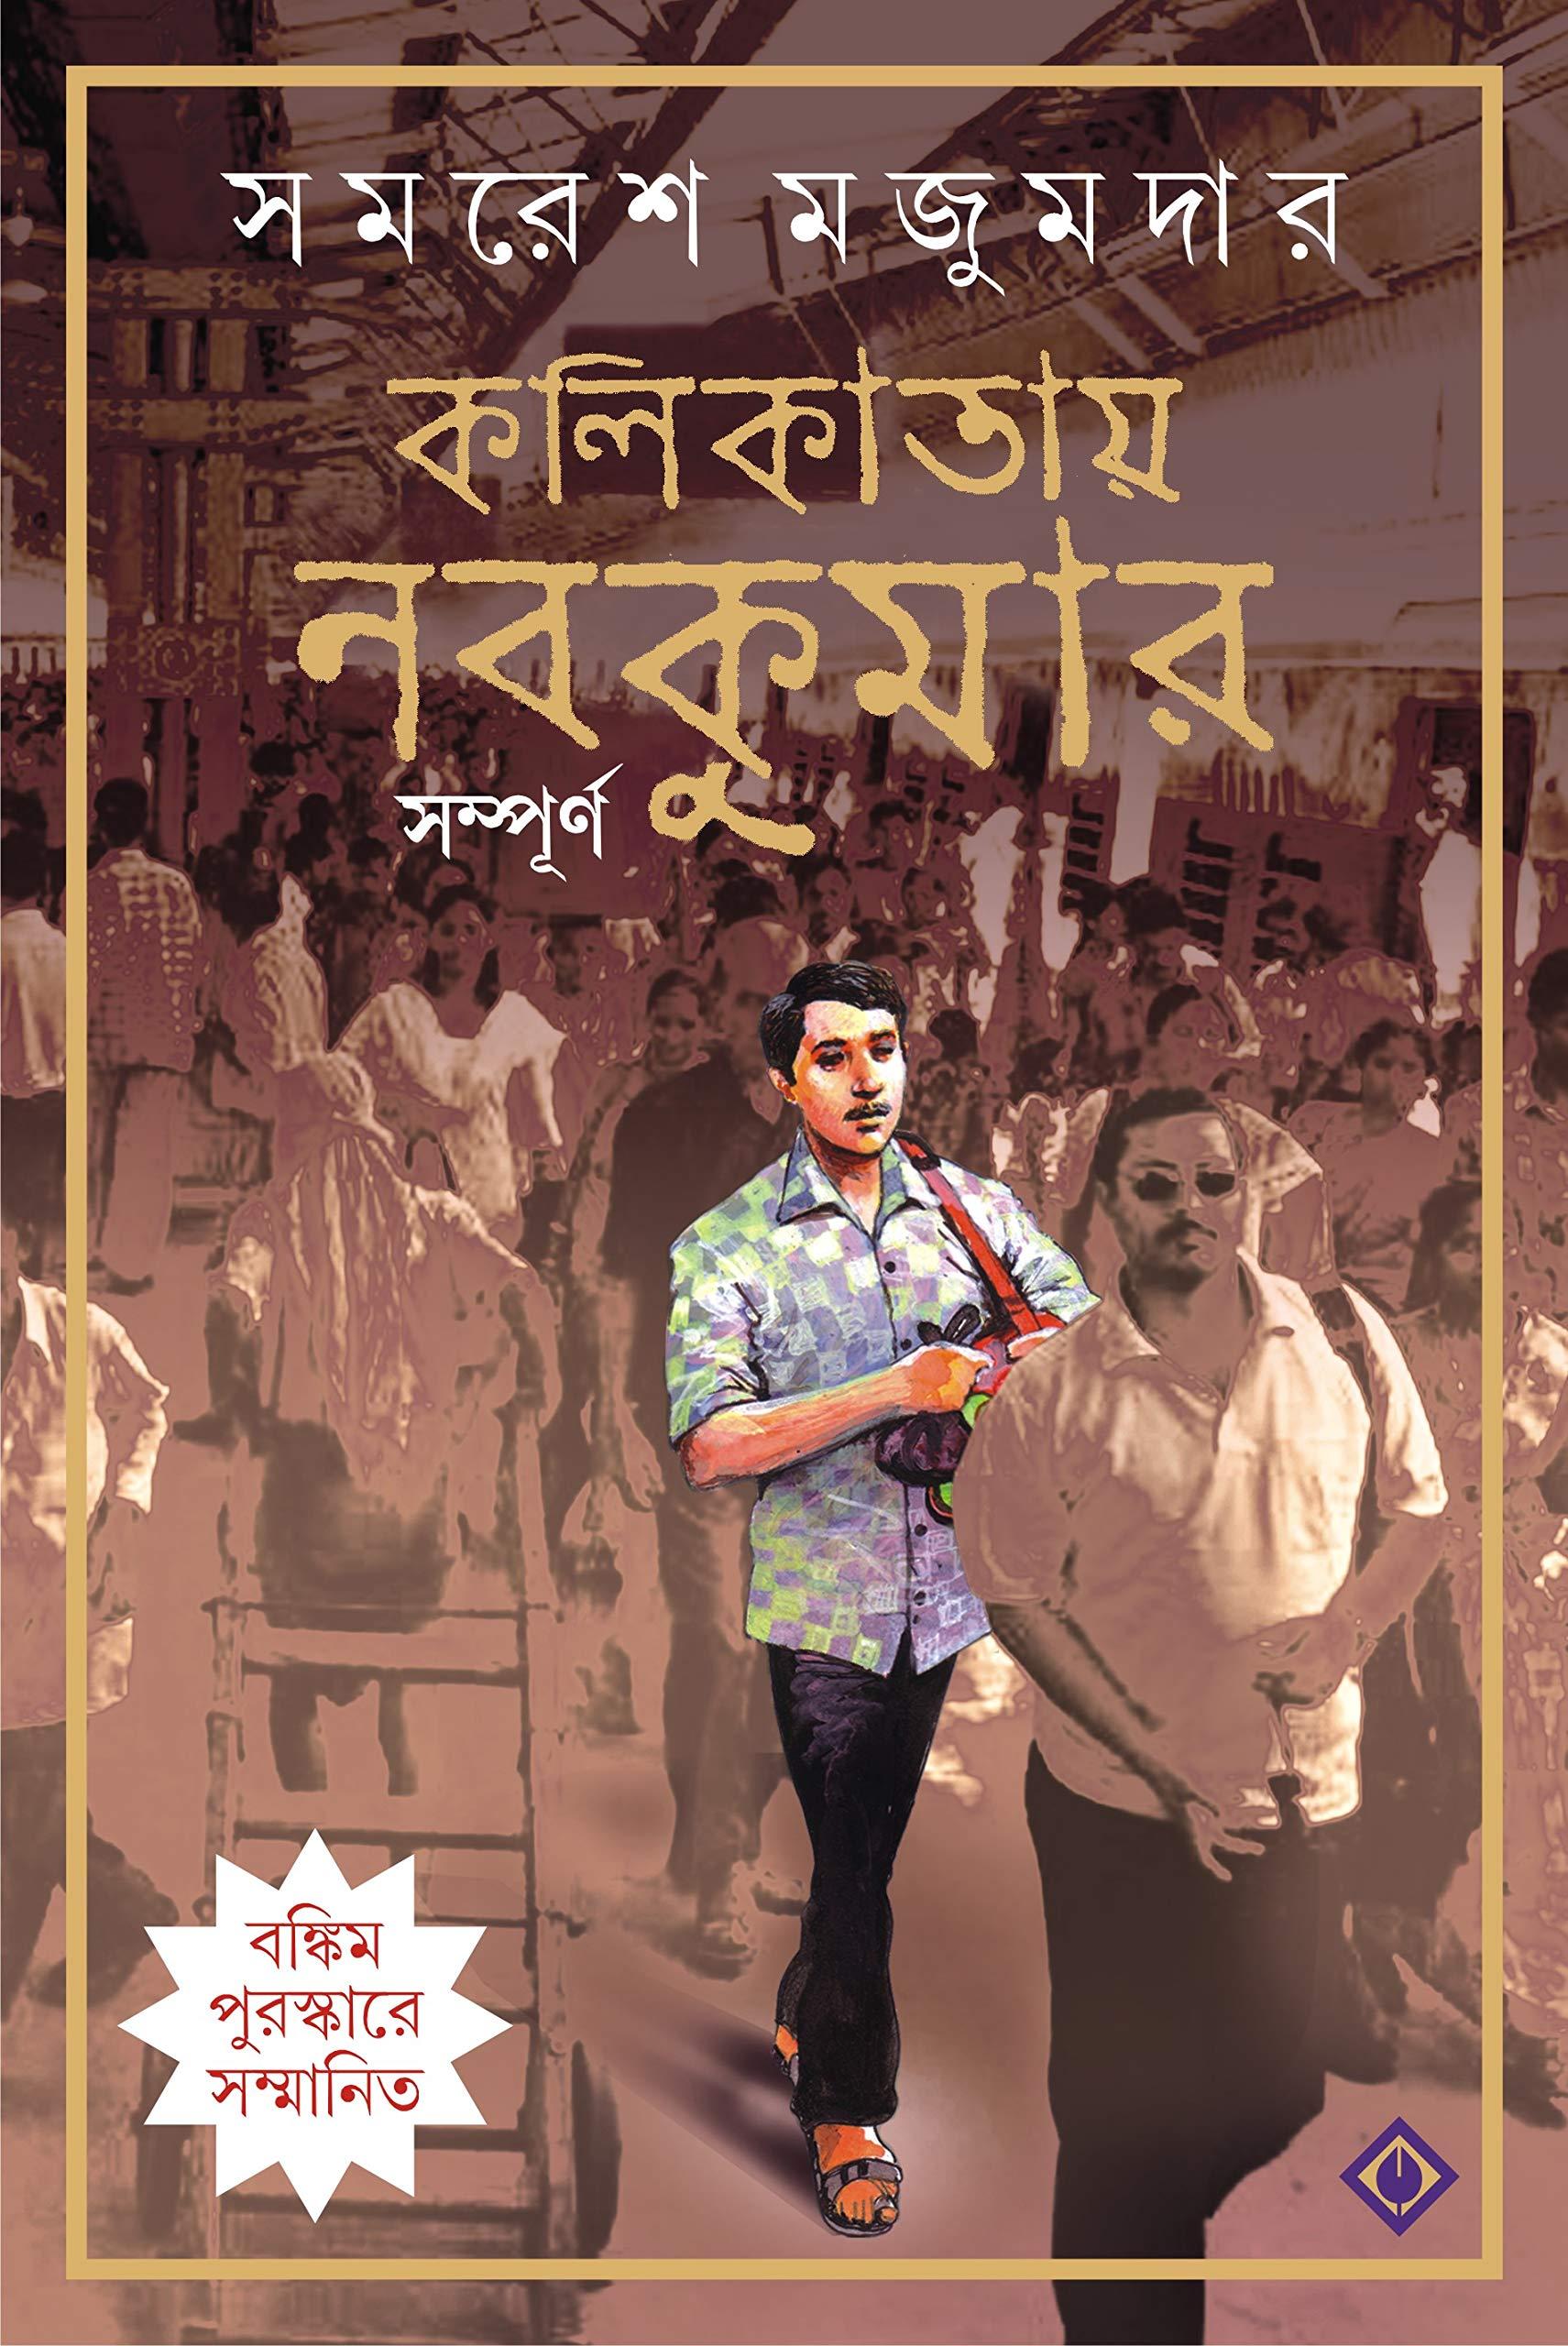 Kalikatay Nabakumar Sampurno   Bengali Adult Fiction   Samaresh Majumdar   Bangla Upanyas   Bankim Puroshkar 2009   Bengali Contemporary Trilogy Novel [Hardcover] SAMARES MAZUMDAR